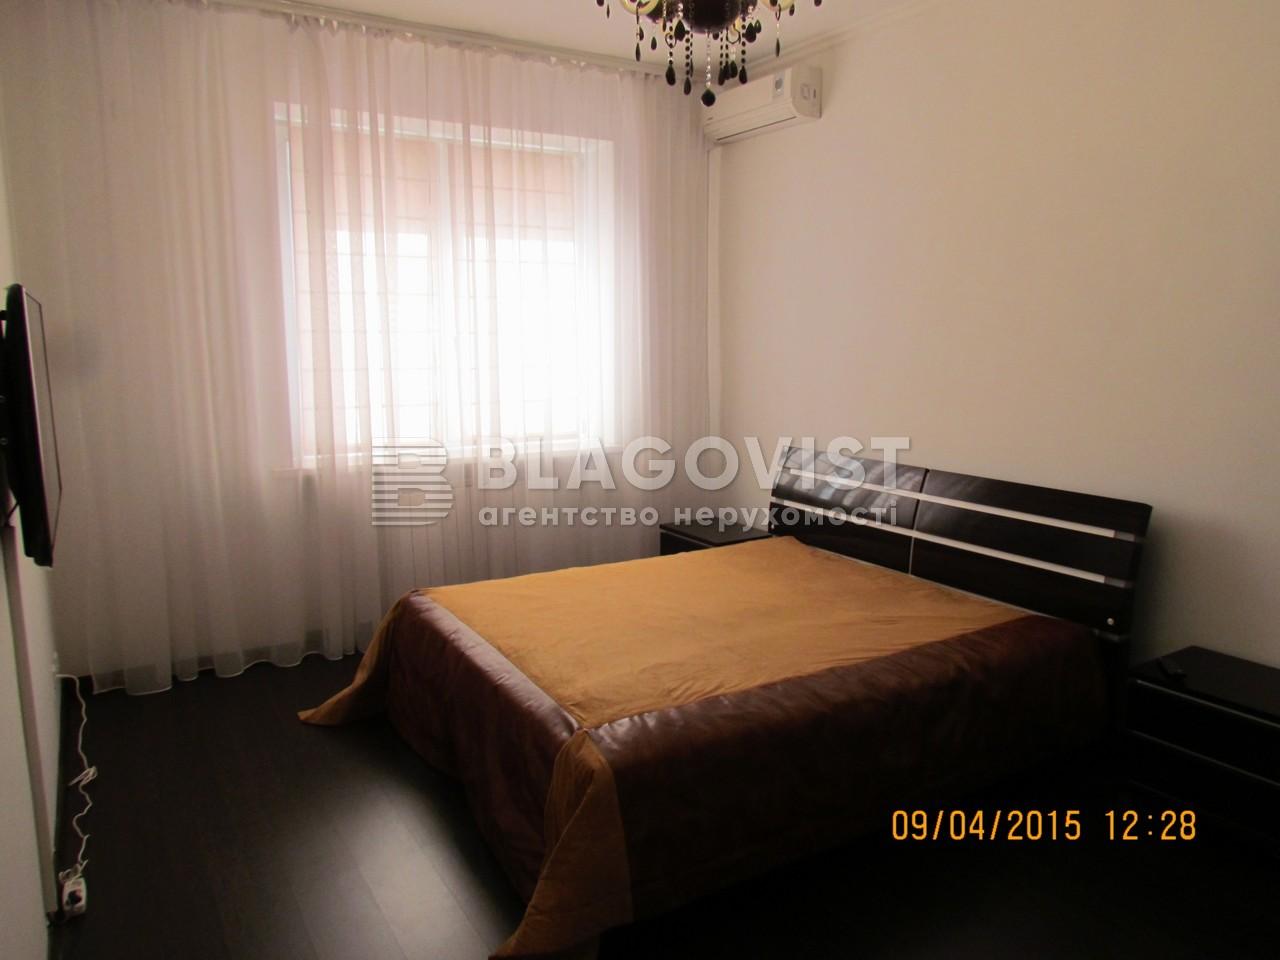 Квартира P-855, Героев Сталинграда просп., 10а, Киев - Фото 7